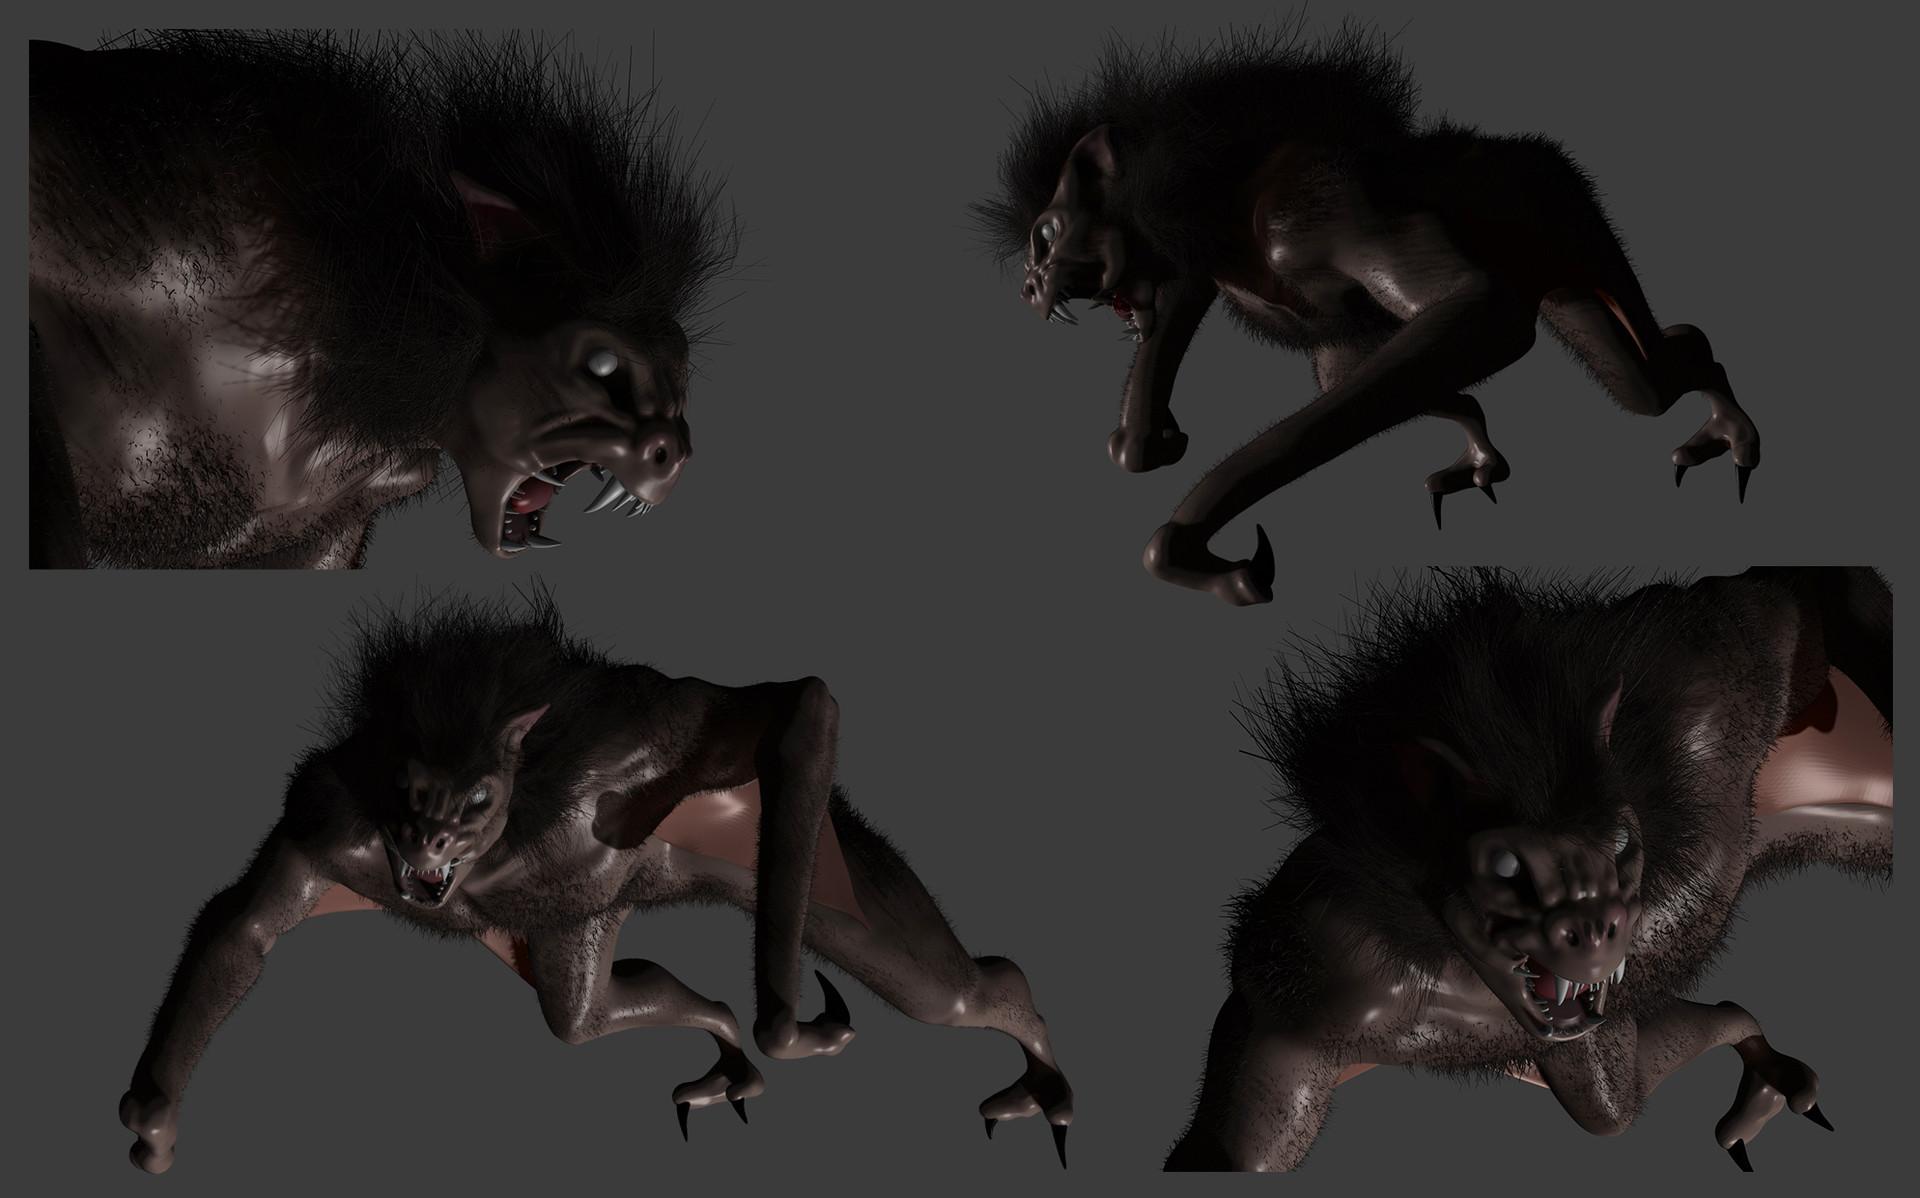 Martin jario giant bat zbrush renders martinjario 2